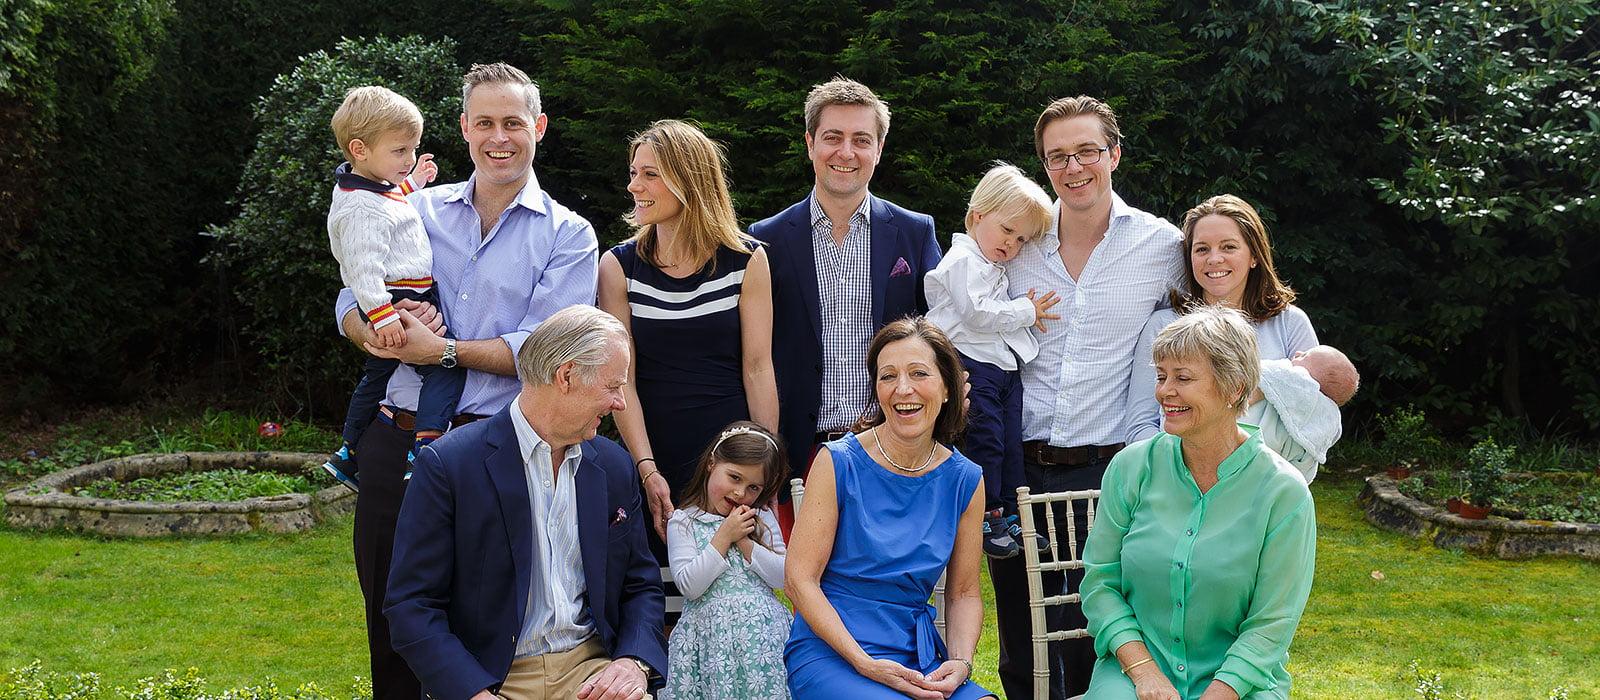 Windsor family portrait photos